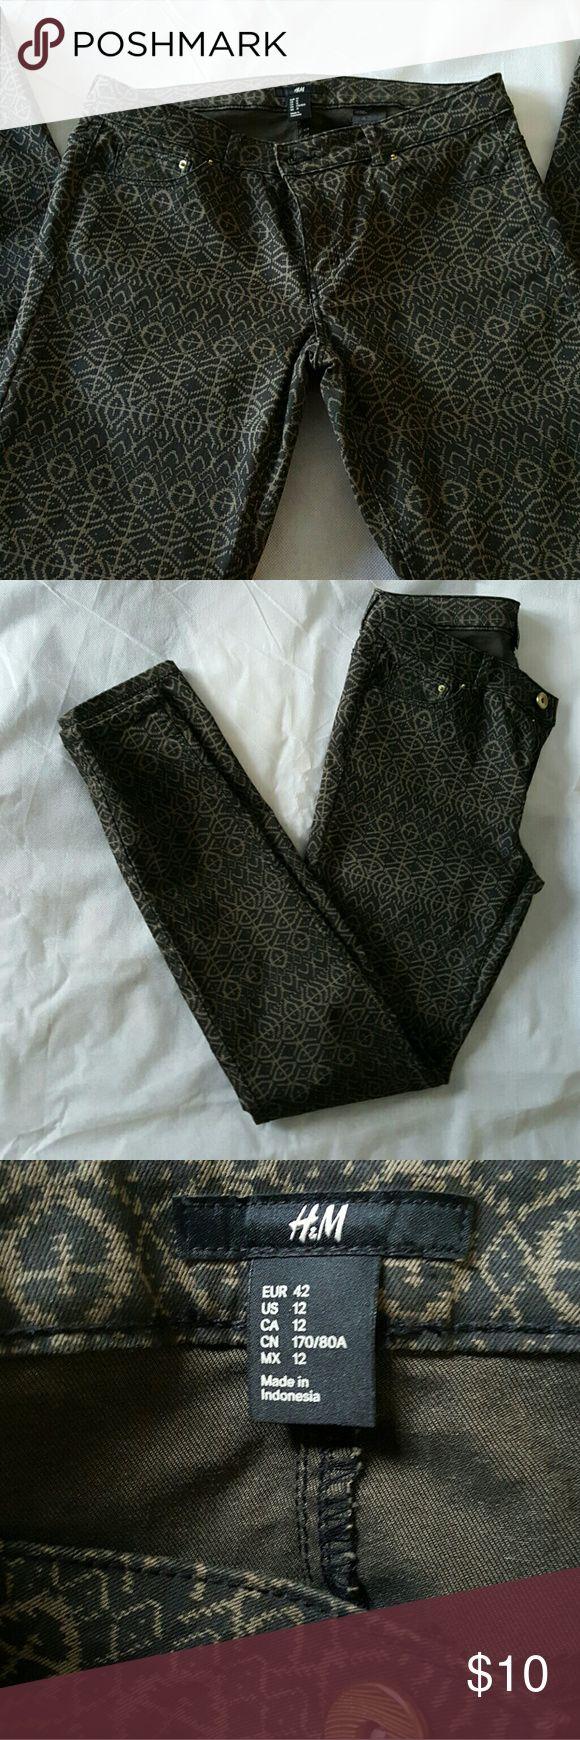 Printed Jegging Printed H&M Jegging. Runs smaller than true size. Geometric/Aztec pattern. H&M Pants Skinny